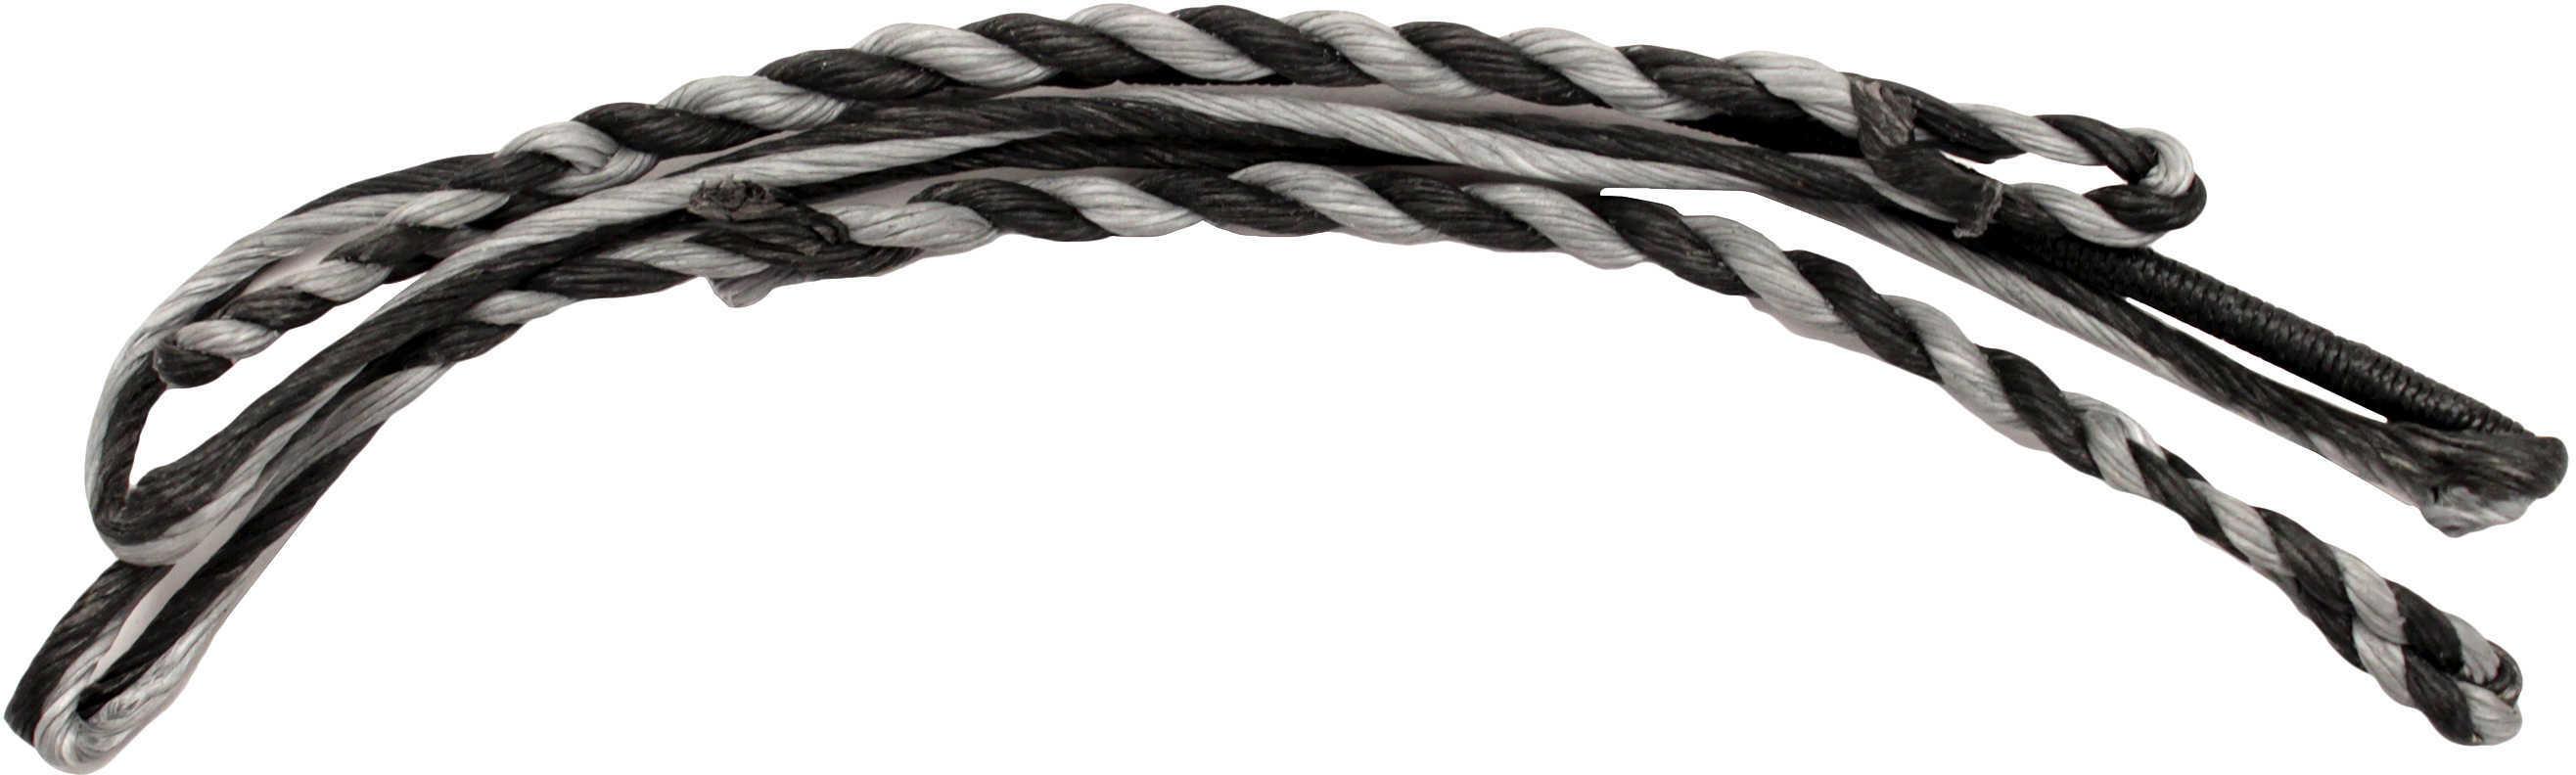 Excalibur Flemish String Black/White Model: 1989